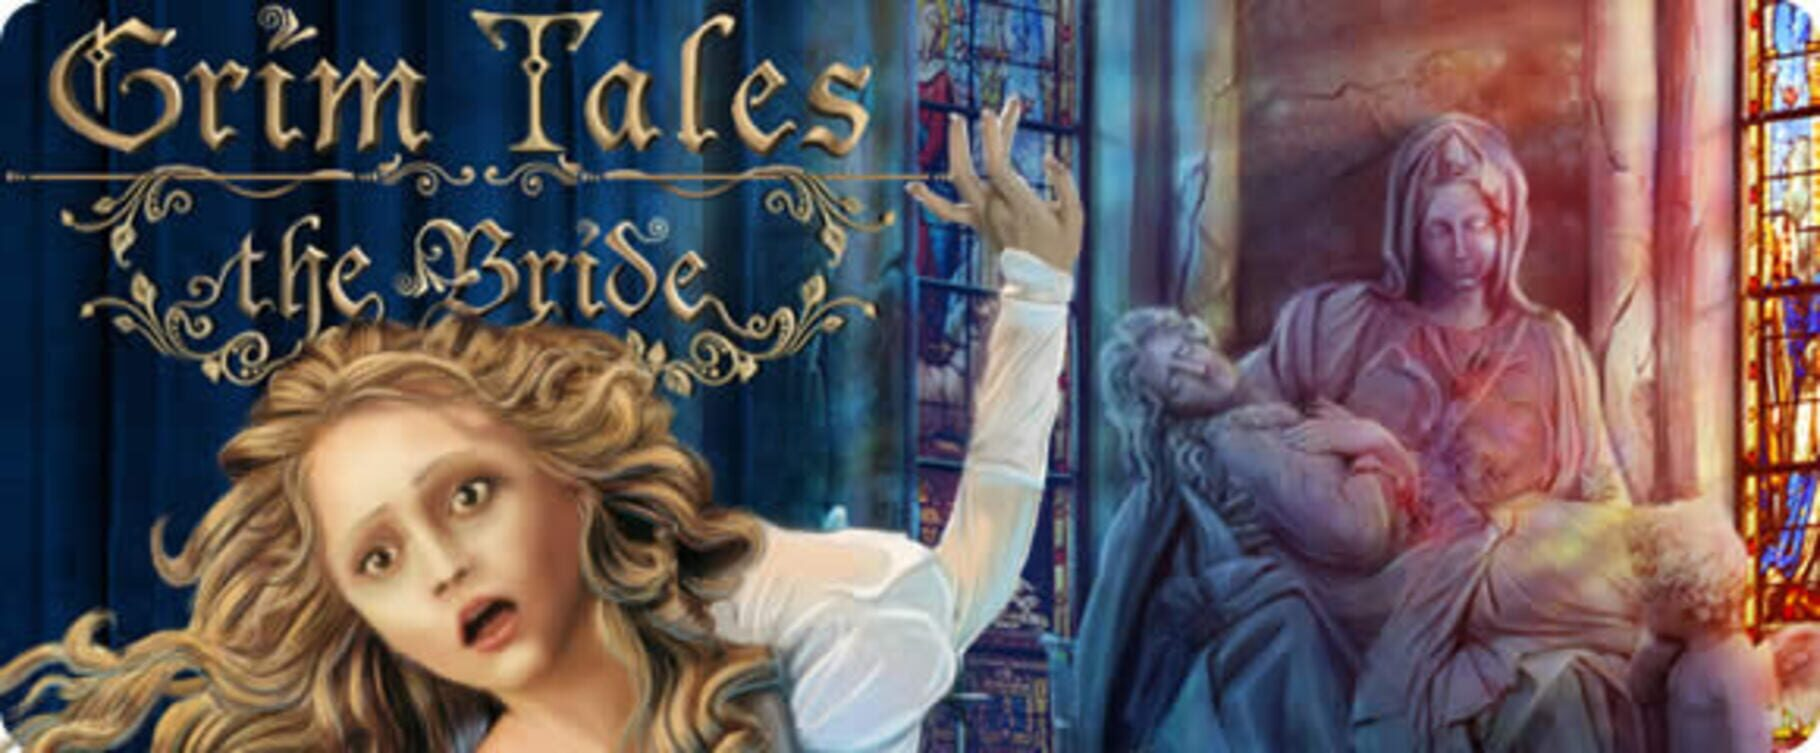 buy Grim Tales: The Bride cd key for all platform